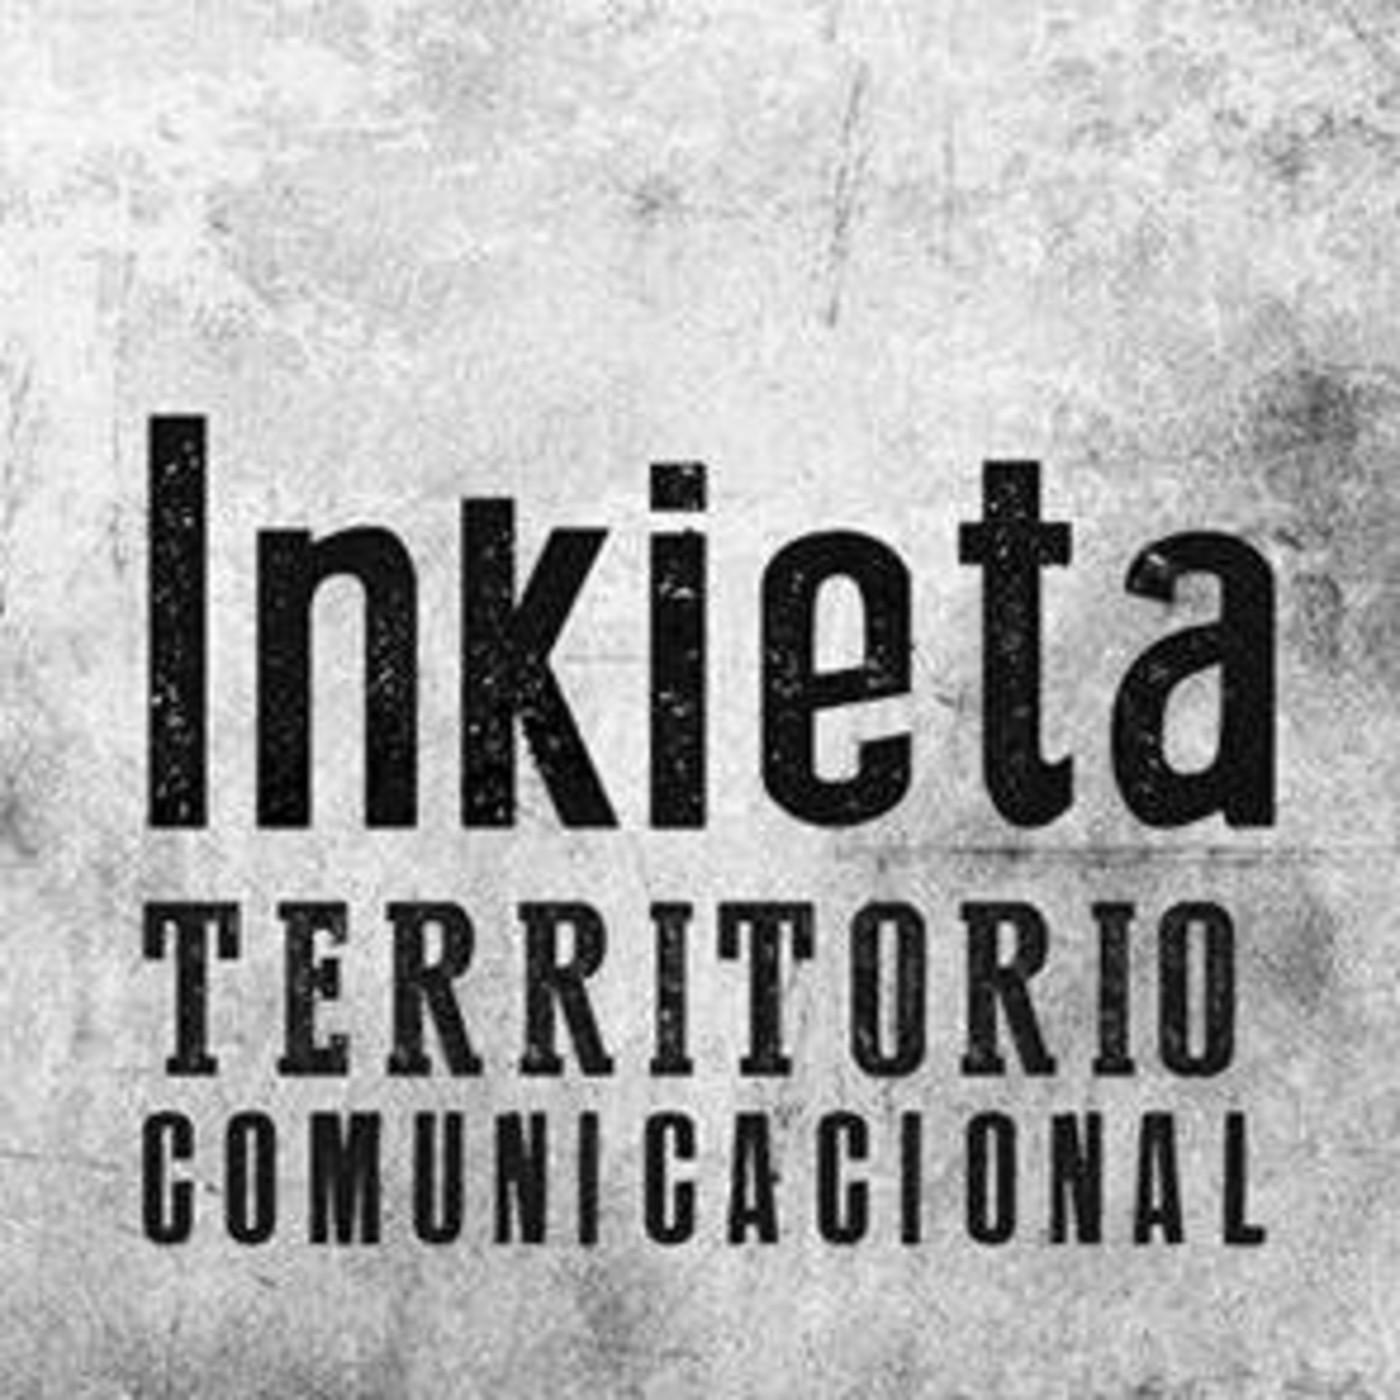 Territorio Comunicacional Inkieta